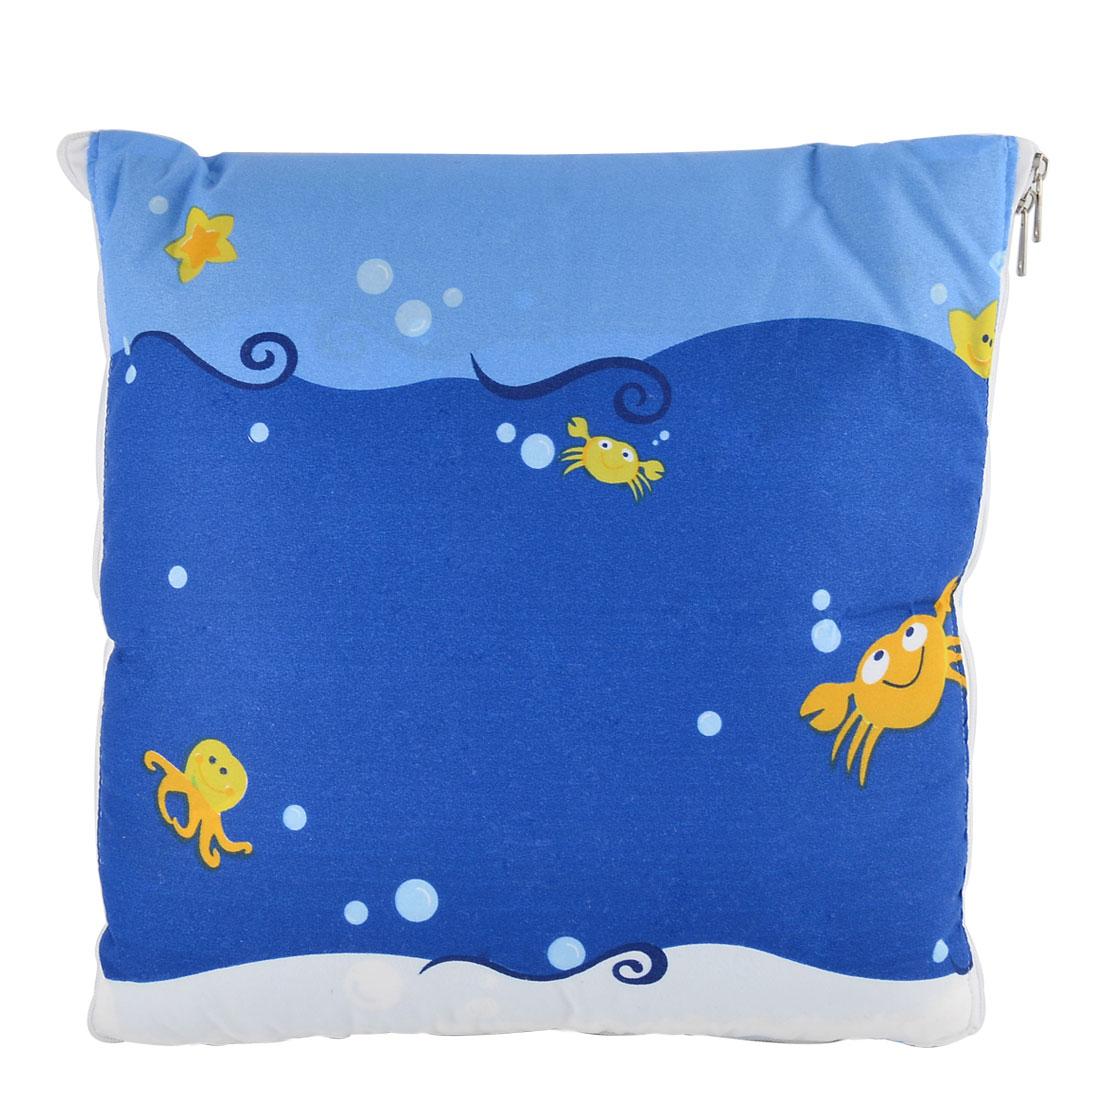 Home Office Car Cotton Blends Sea Animals Print Zippered Pillow Cushion Quilt Dual 40 x 40cm